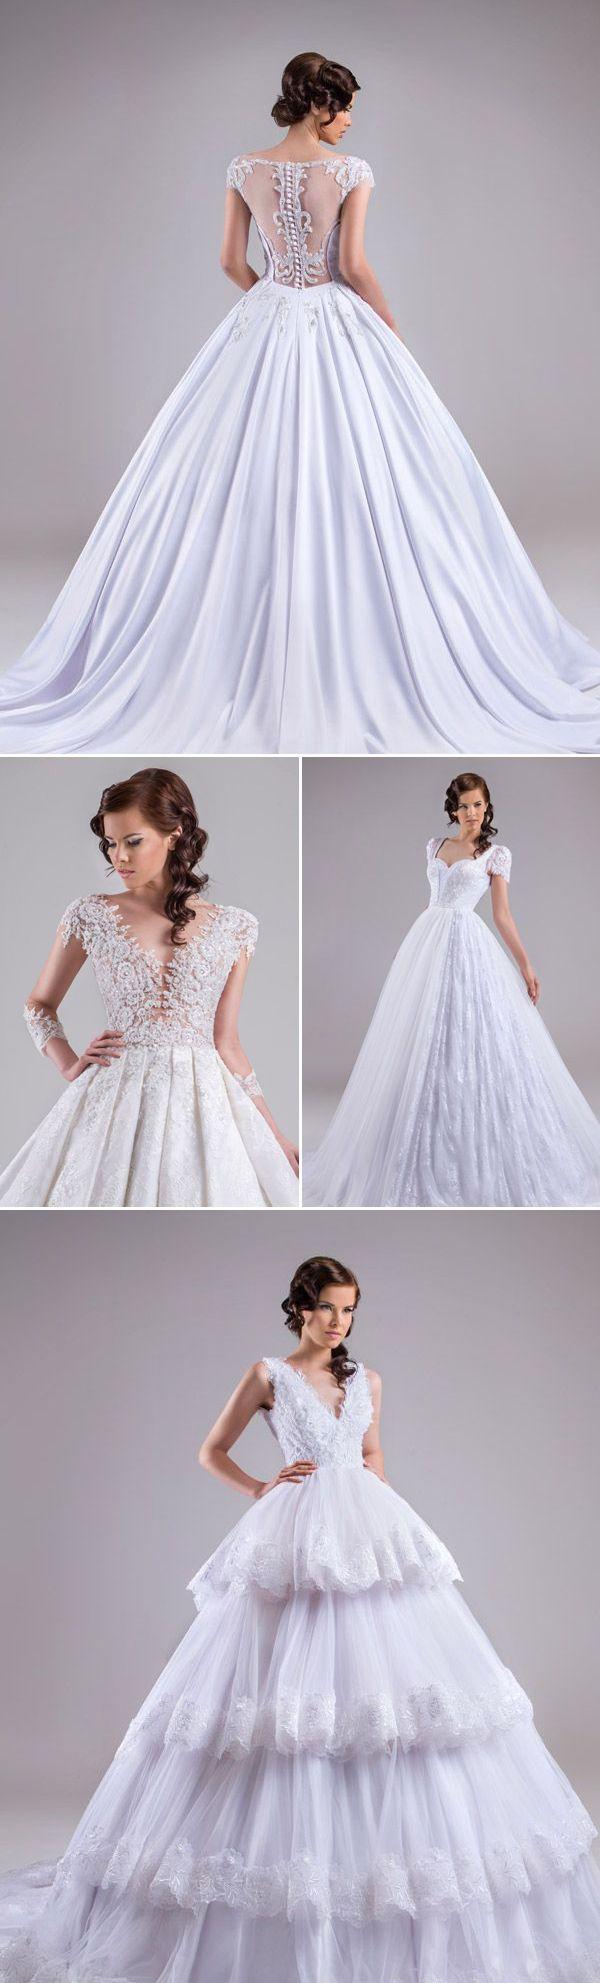 Doll wedding dress   Sweet Baby DollInspired Wedding Dresses Youull Love  Wedding